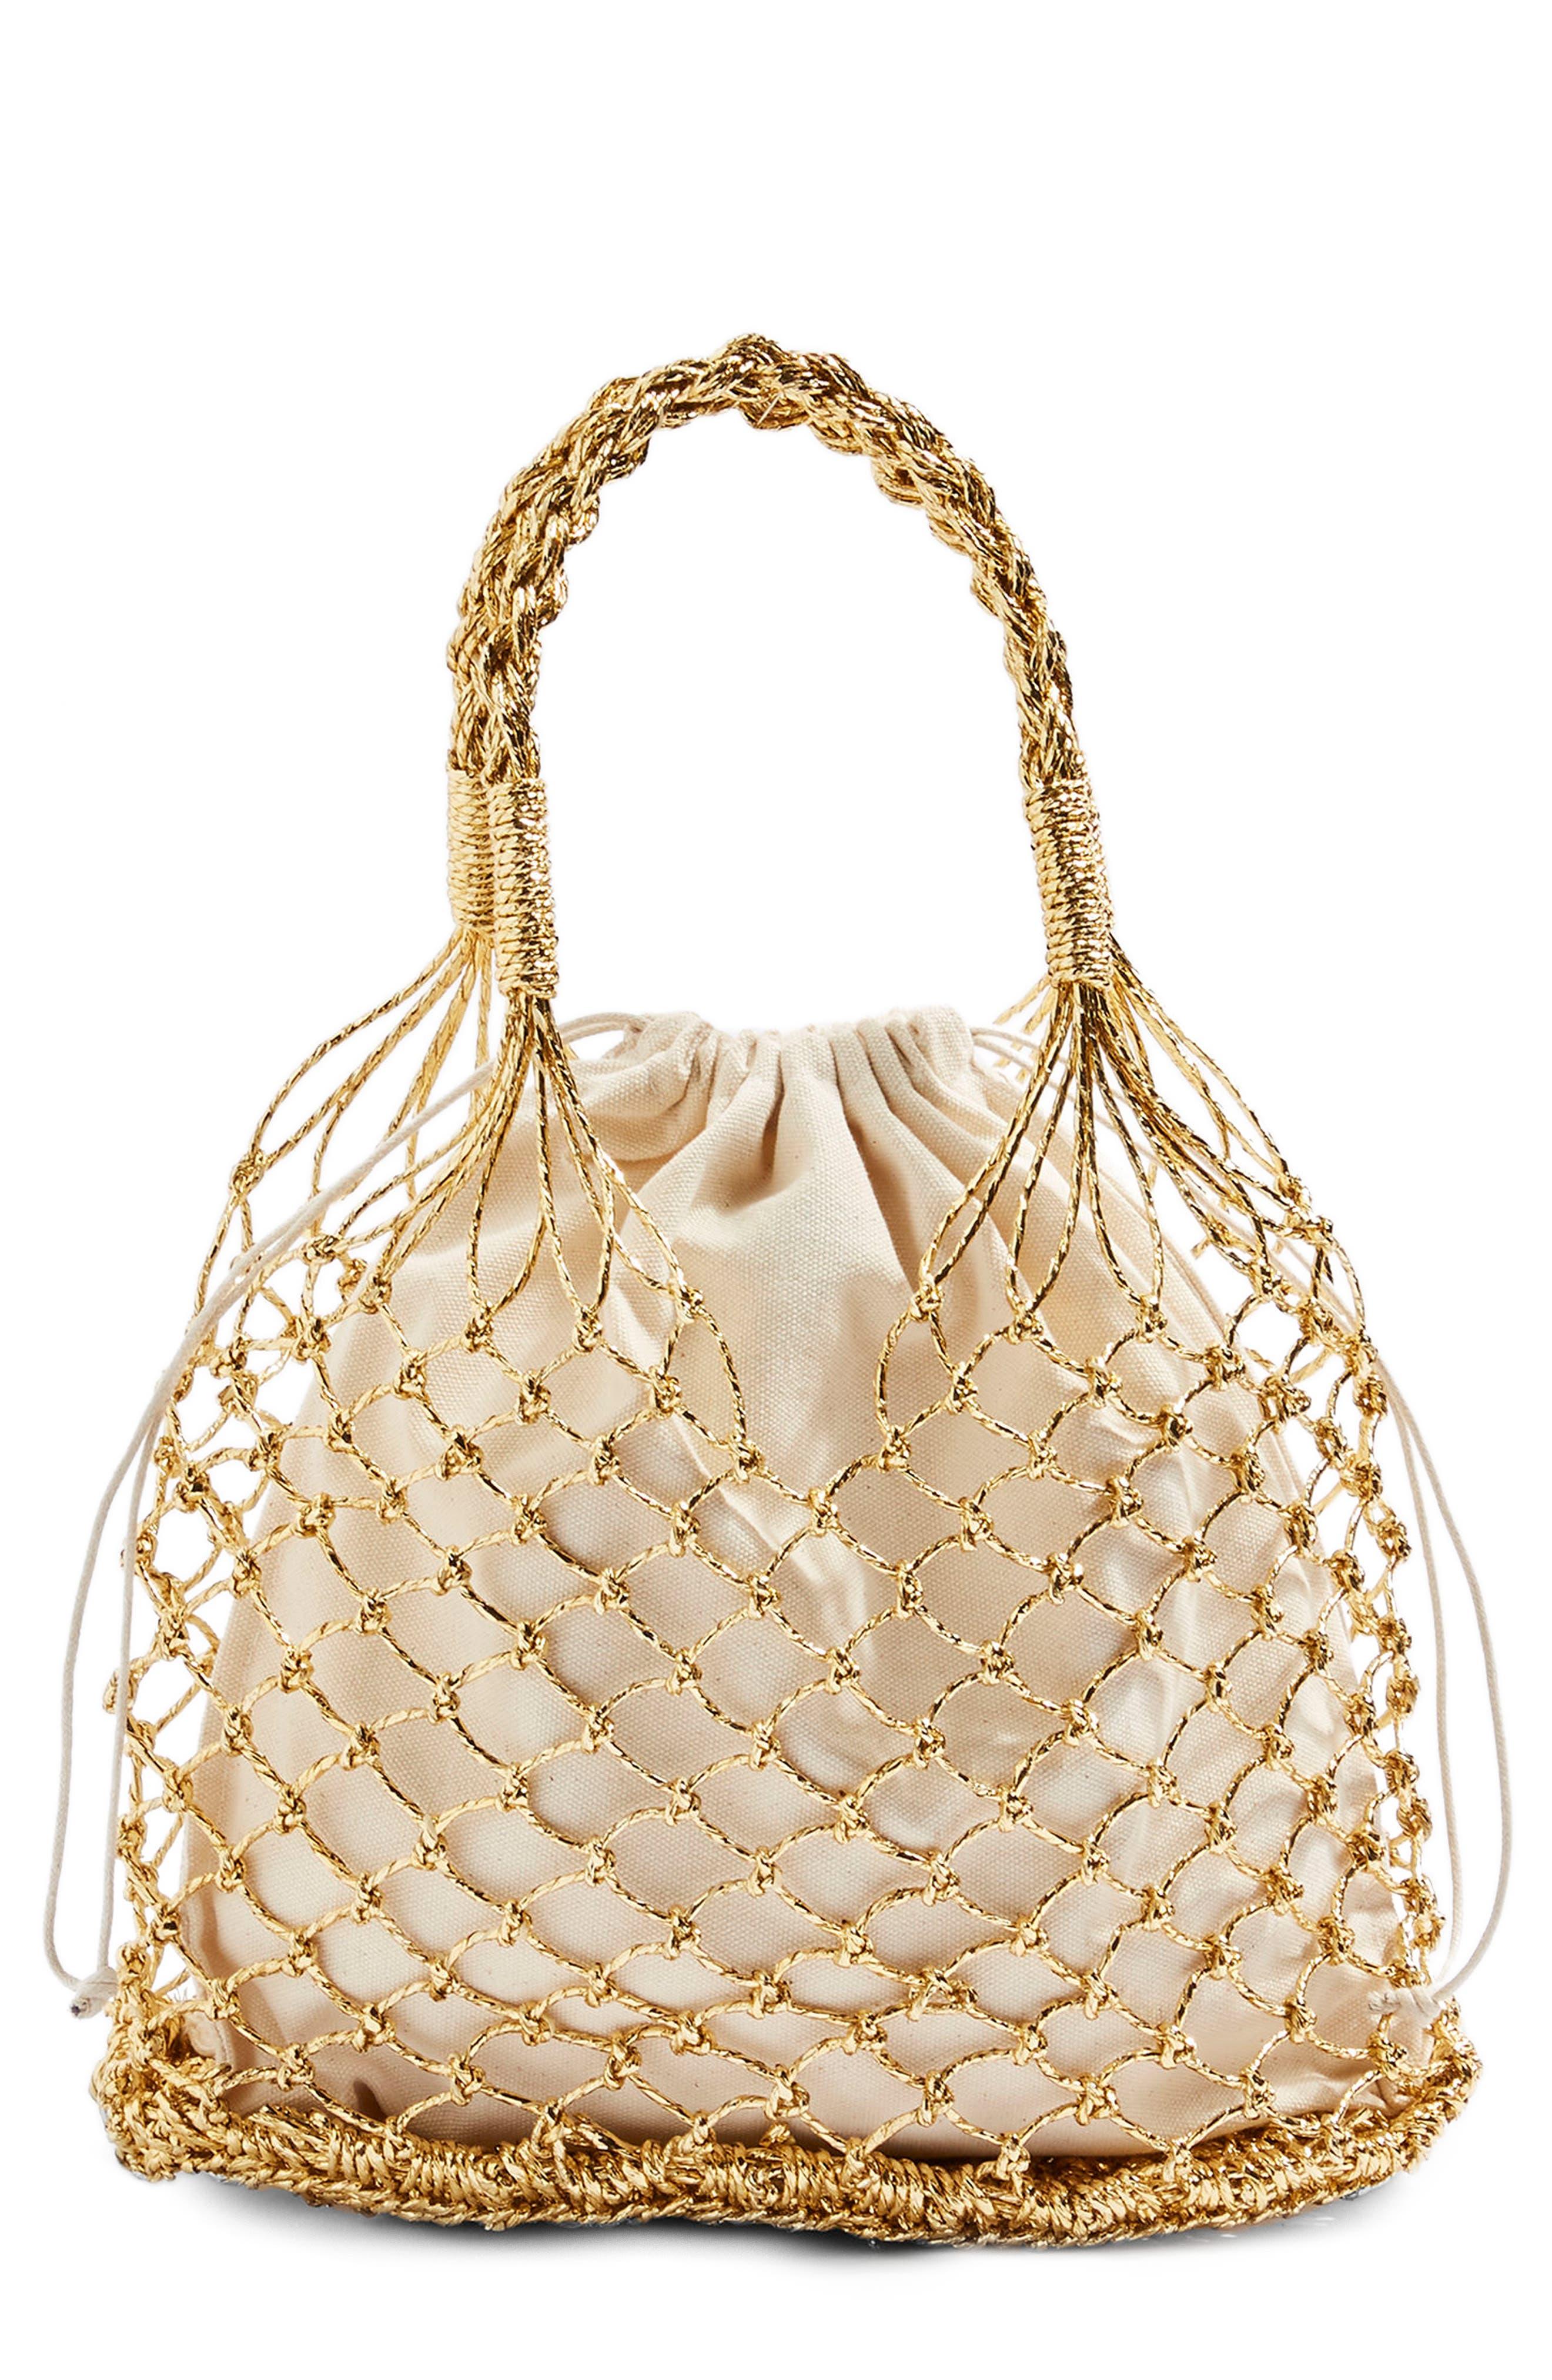 Topshop Shakira Woven Shopper